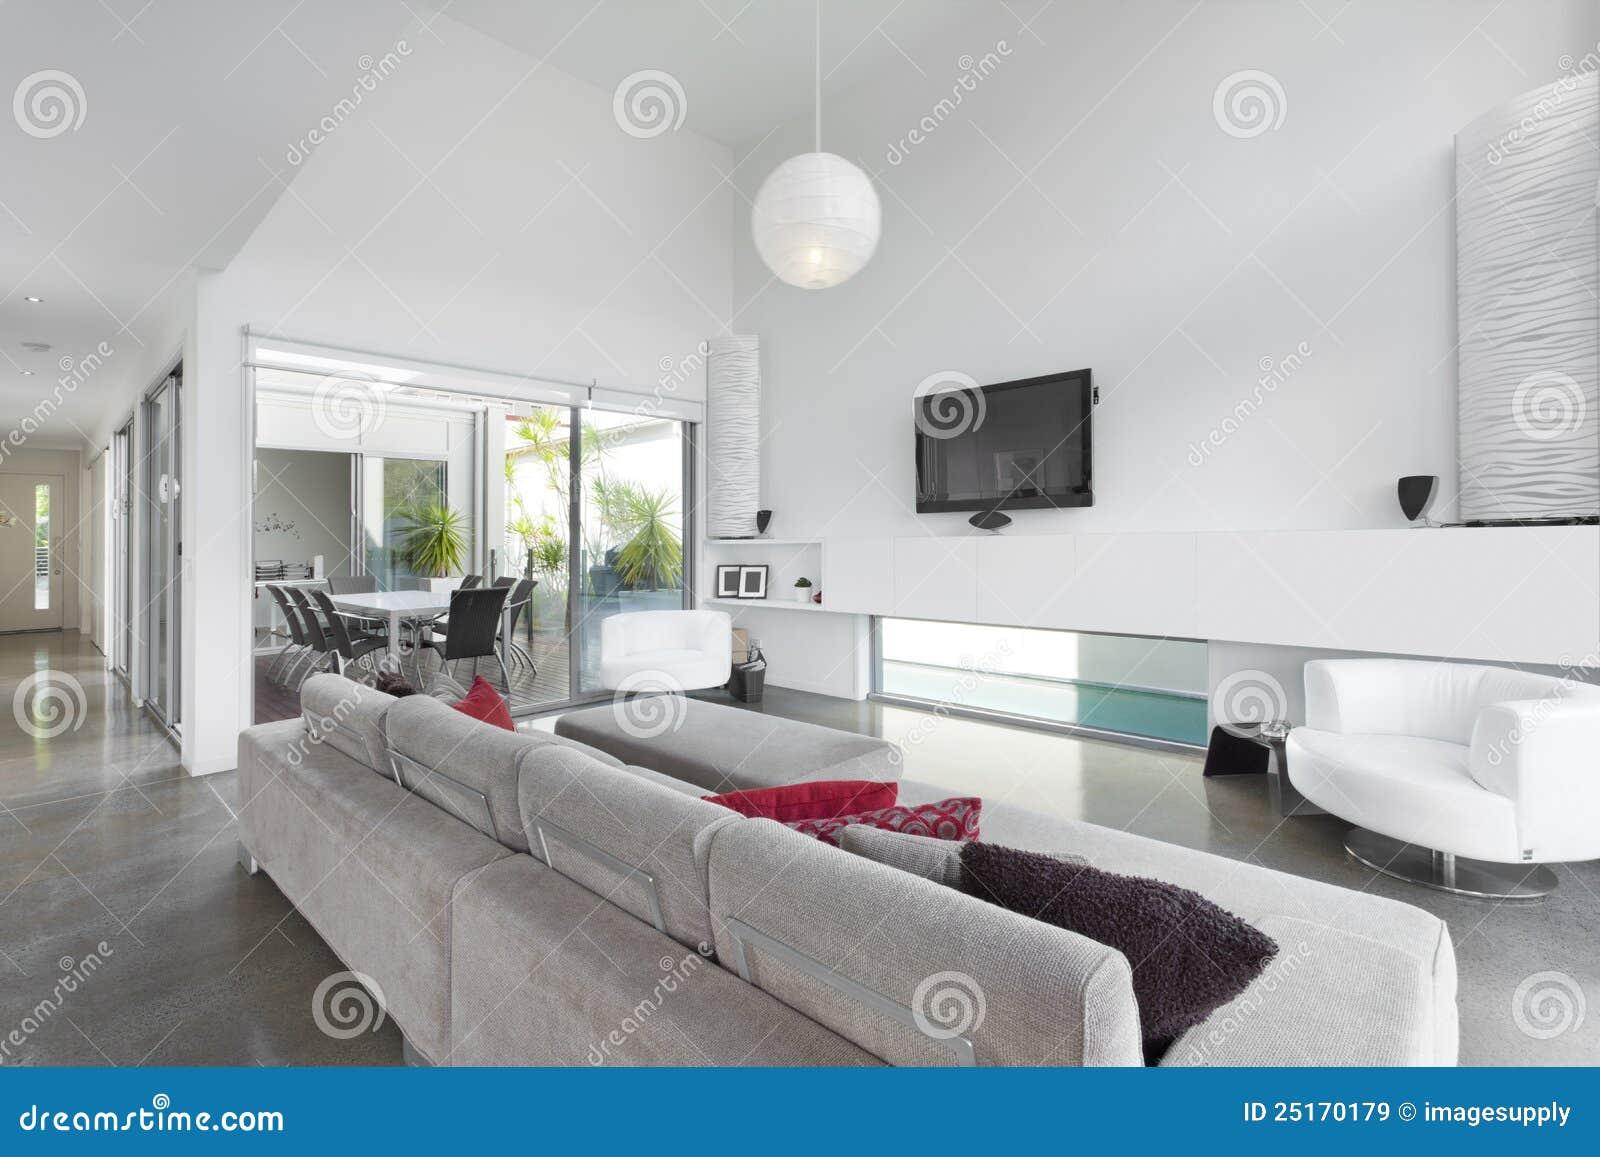 Moderne woonkamer royalty vrije stock afbeeldingen afbeelding 25170179 for Deco woonkamer moderne woonkamer